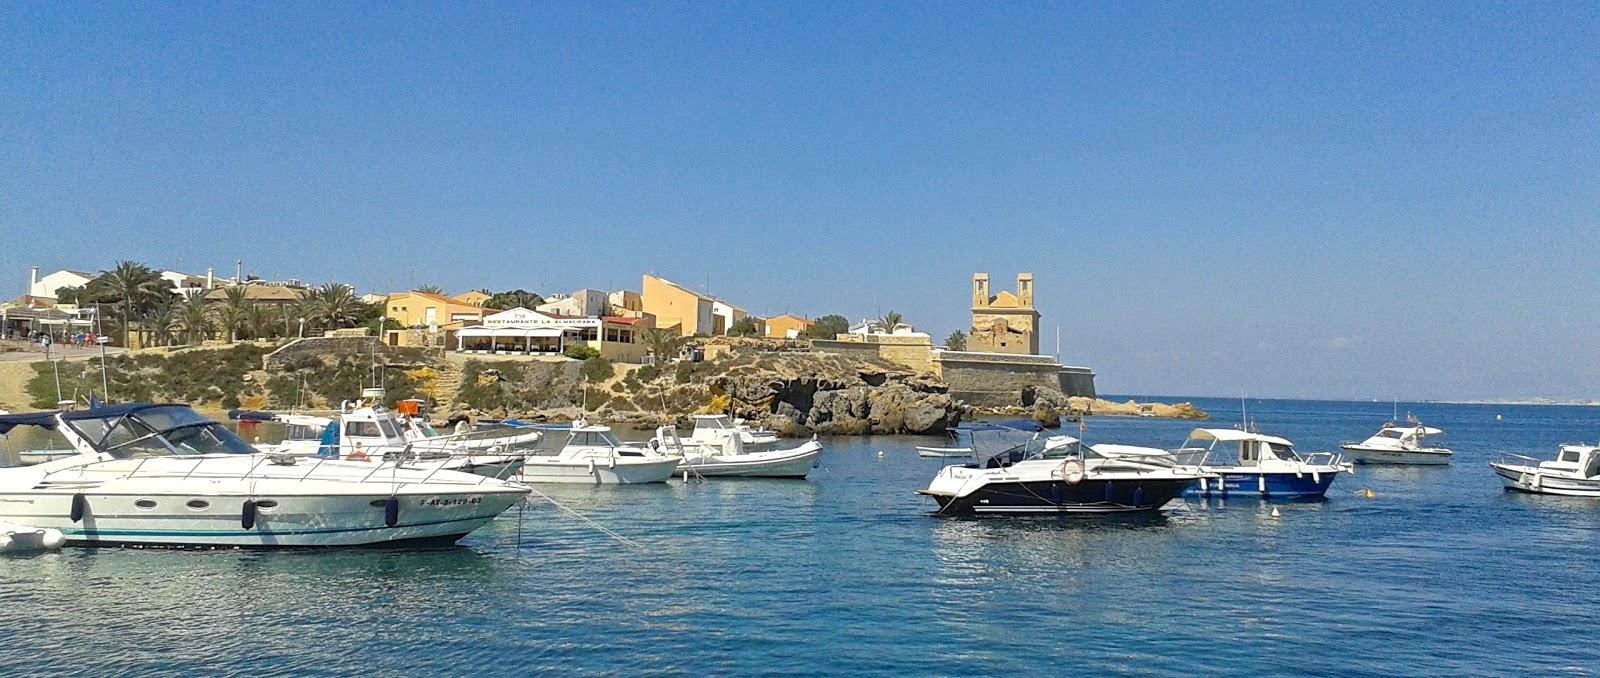 Ows alicante traves a pirata a la isla de tabarca - Hoteles en isla tabarca ...